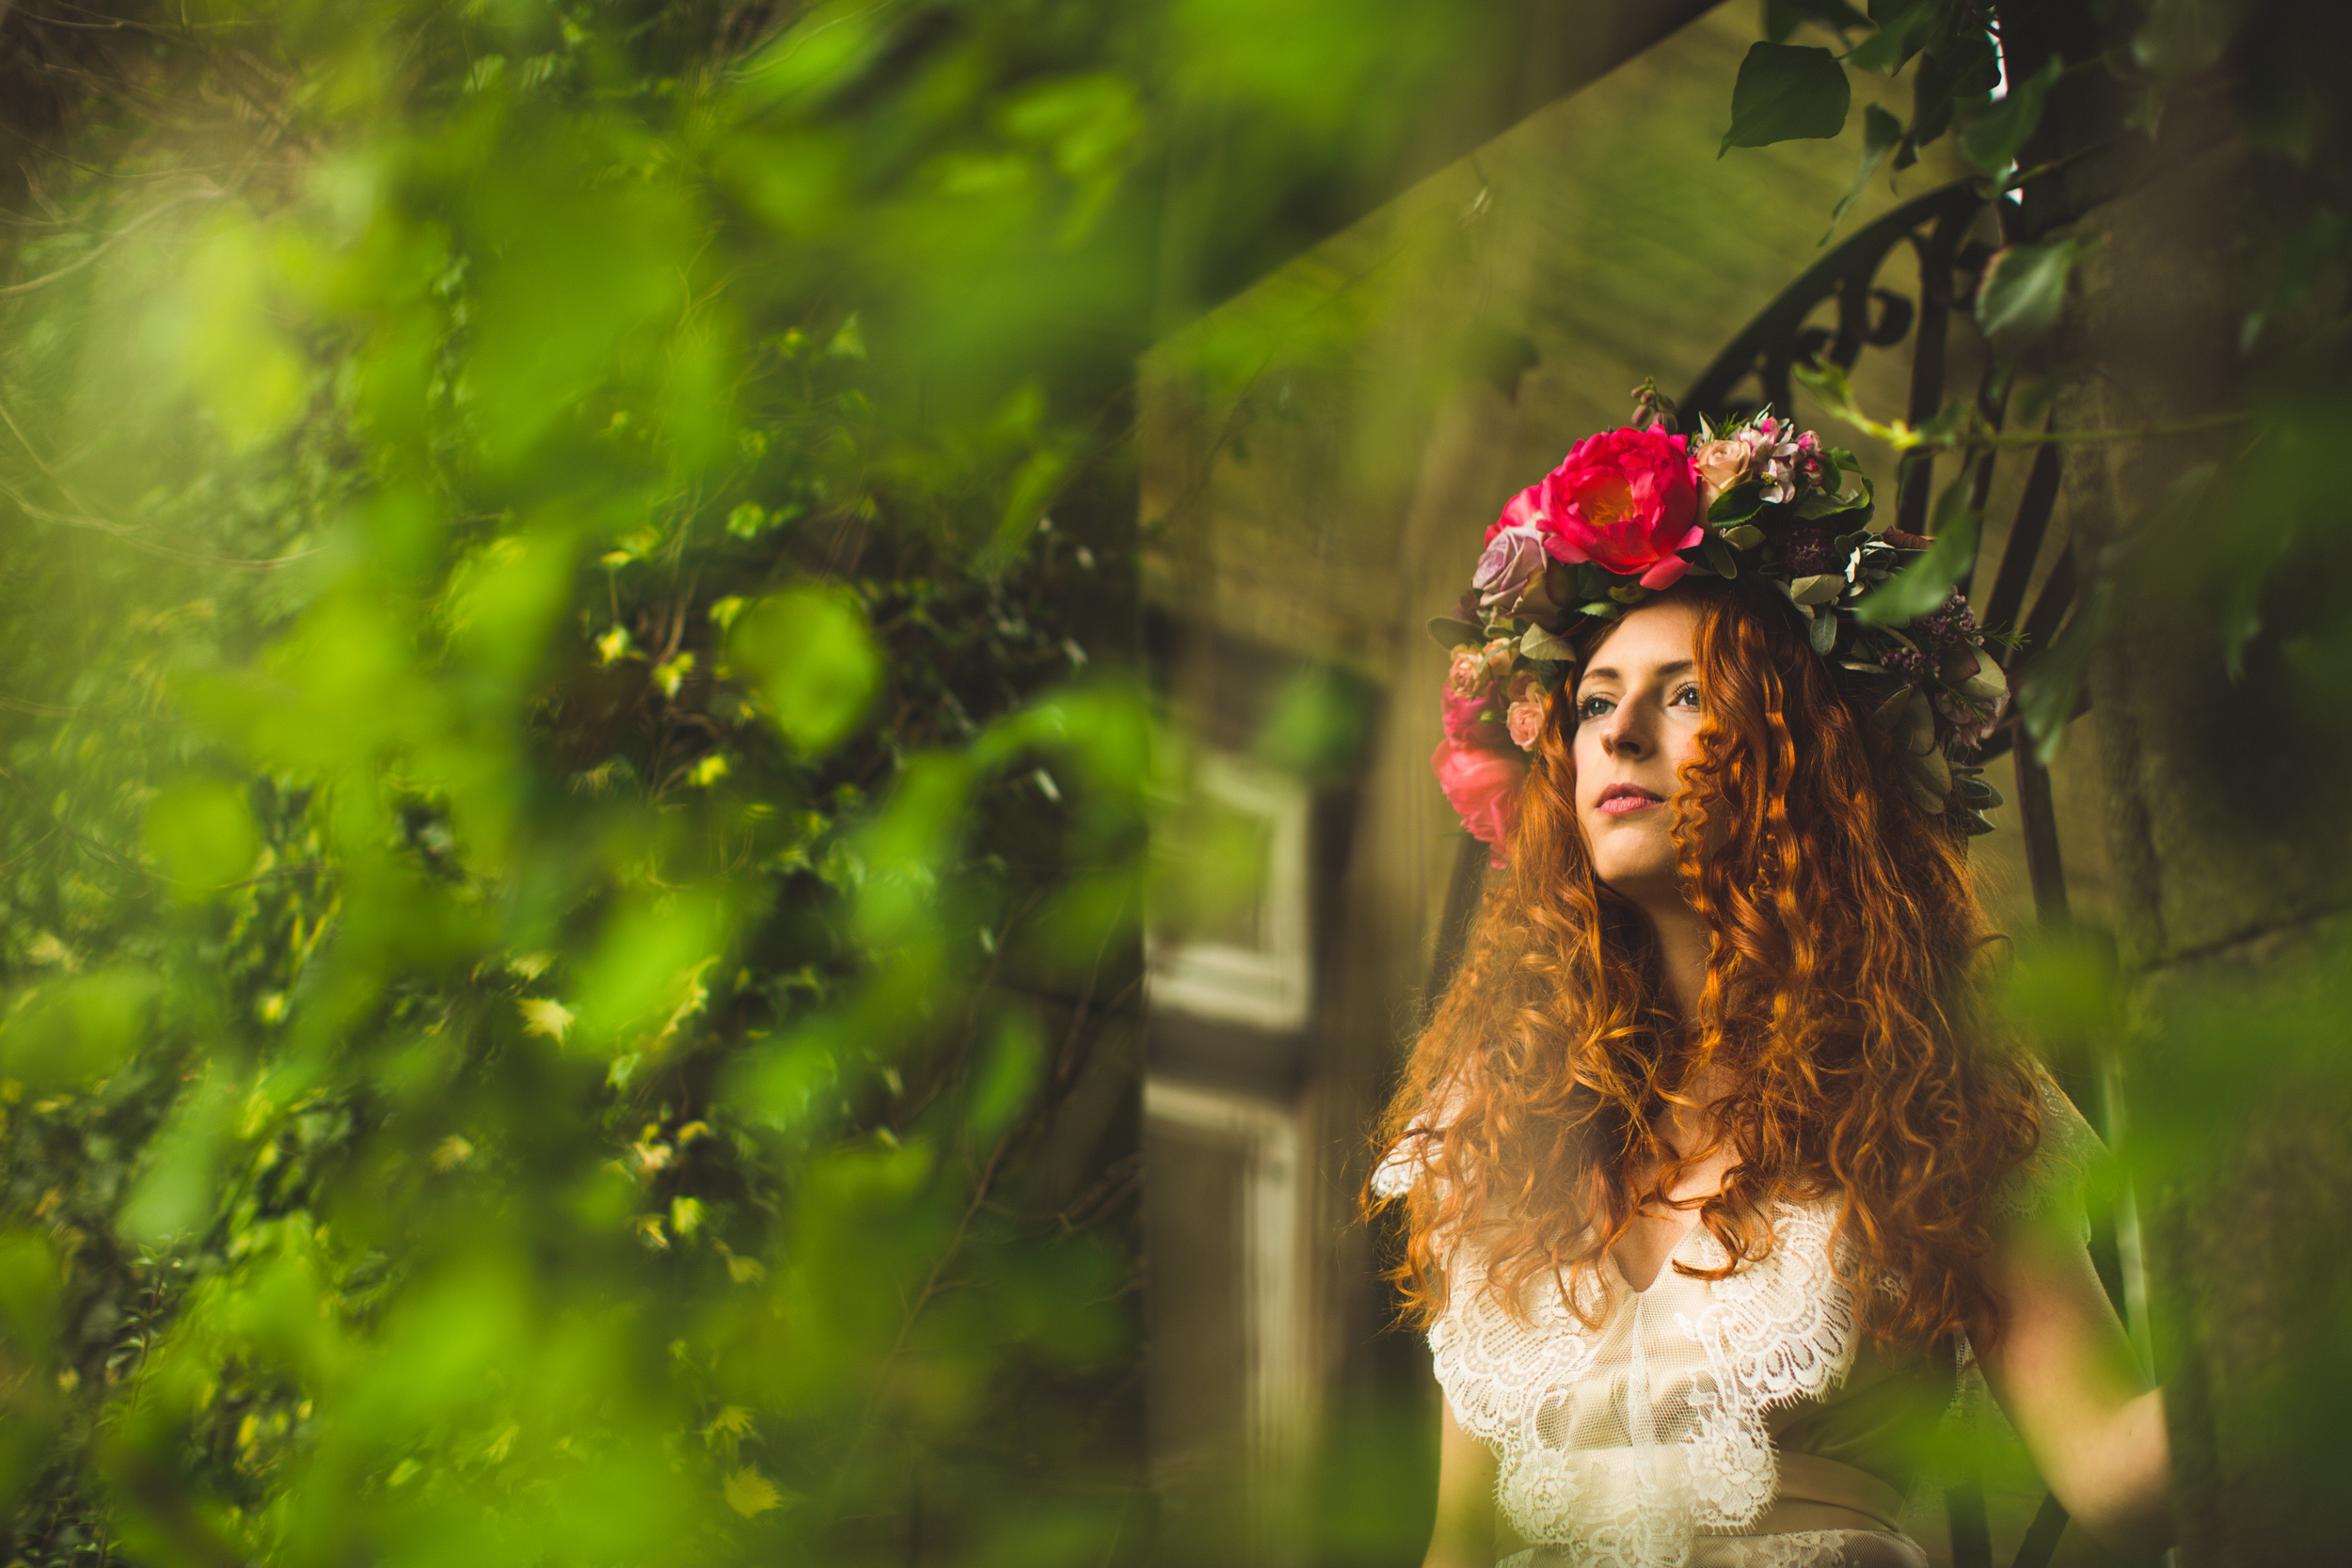 kate-beaumont-vintage-inspired-bridal-wedding-dresses-Sheffield-S6-3.jpg